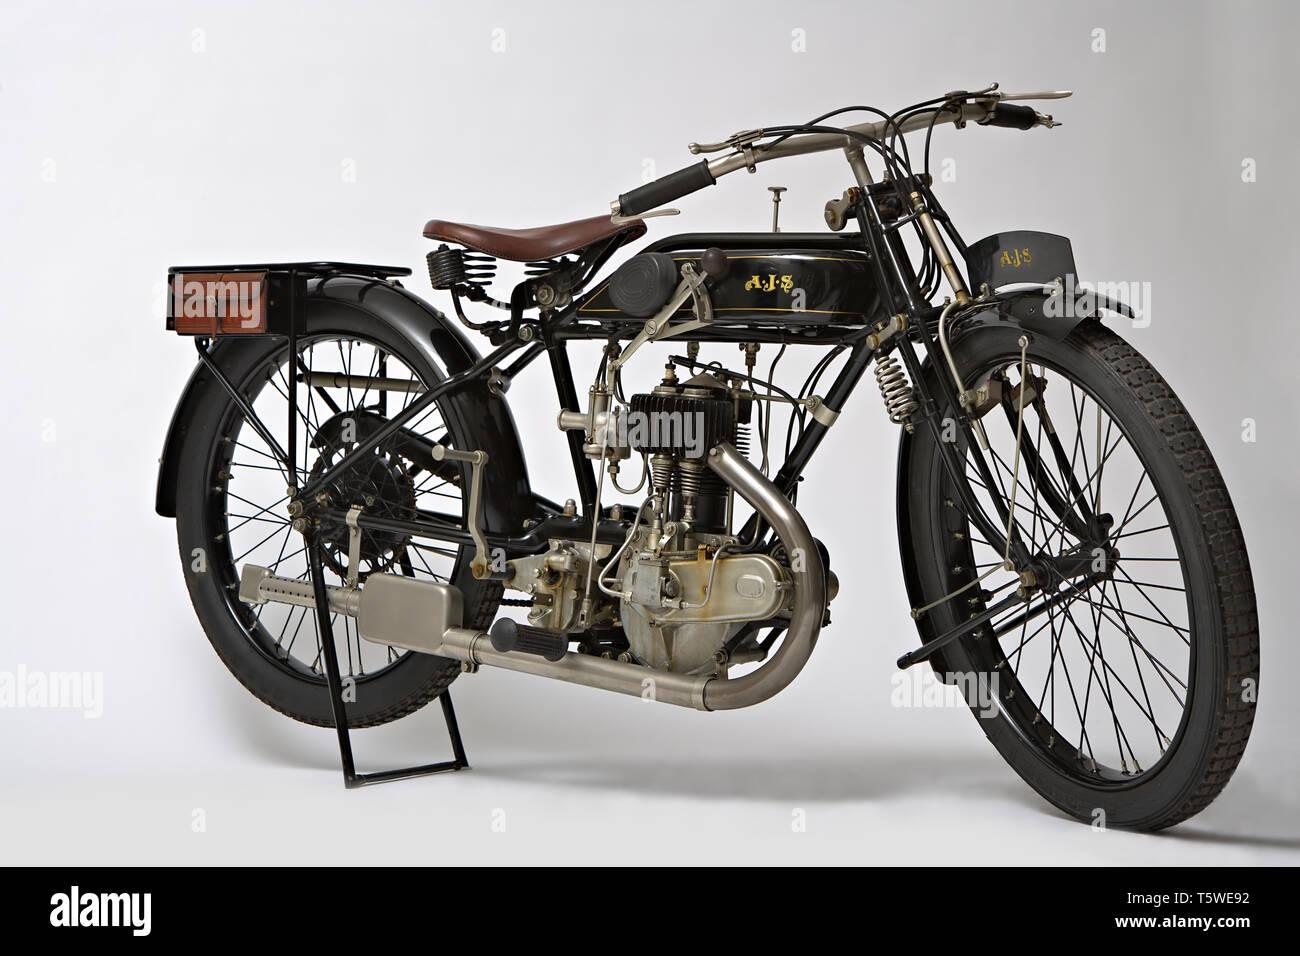 Moto d'epoca SJA ES 350 Marque: SJA modello: ES 350 nazione: Francia - Londra anno: 1925 conditions: restaurata cilindrata: 350 Banque D'Images